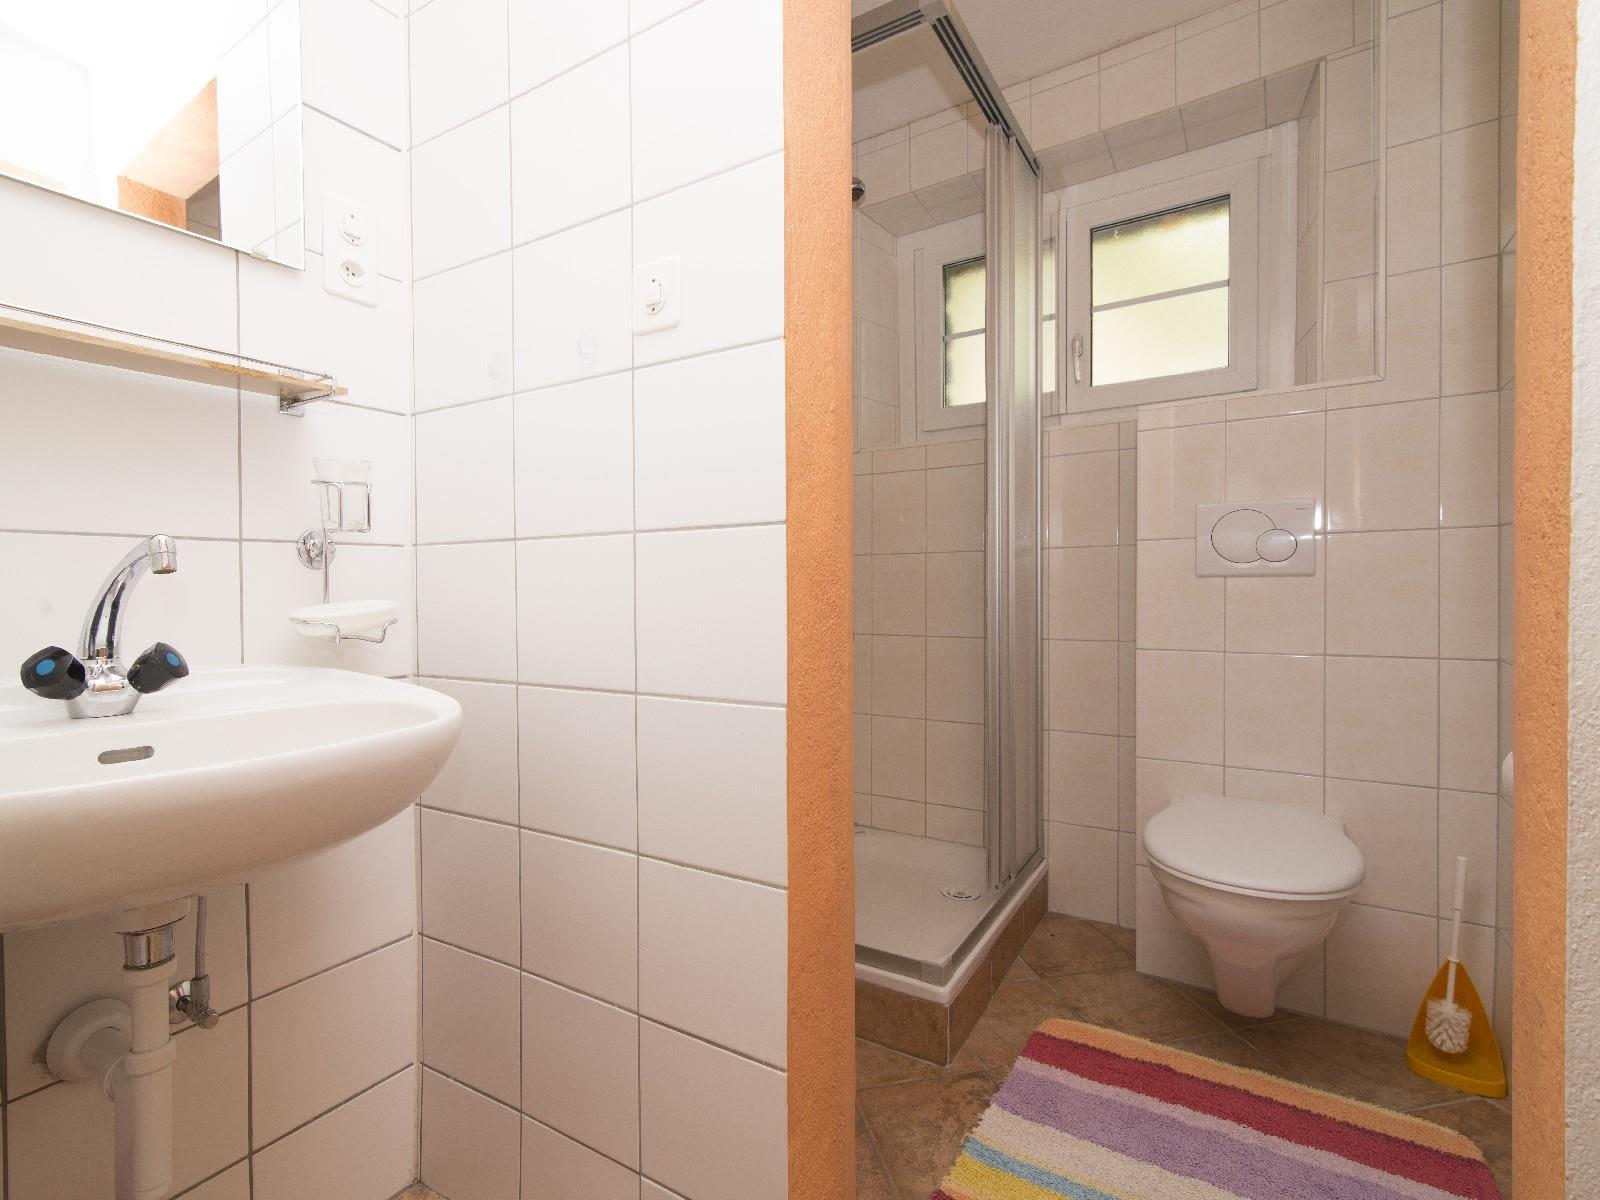 7.2 WC Dusch Lavabo